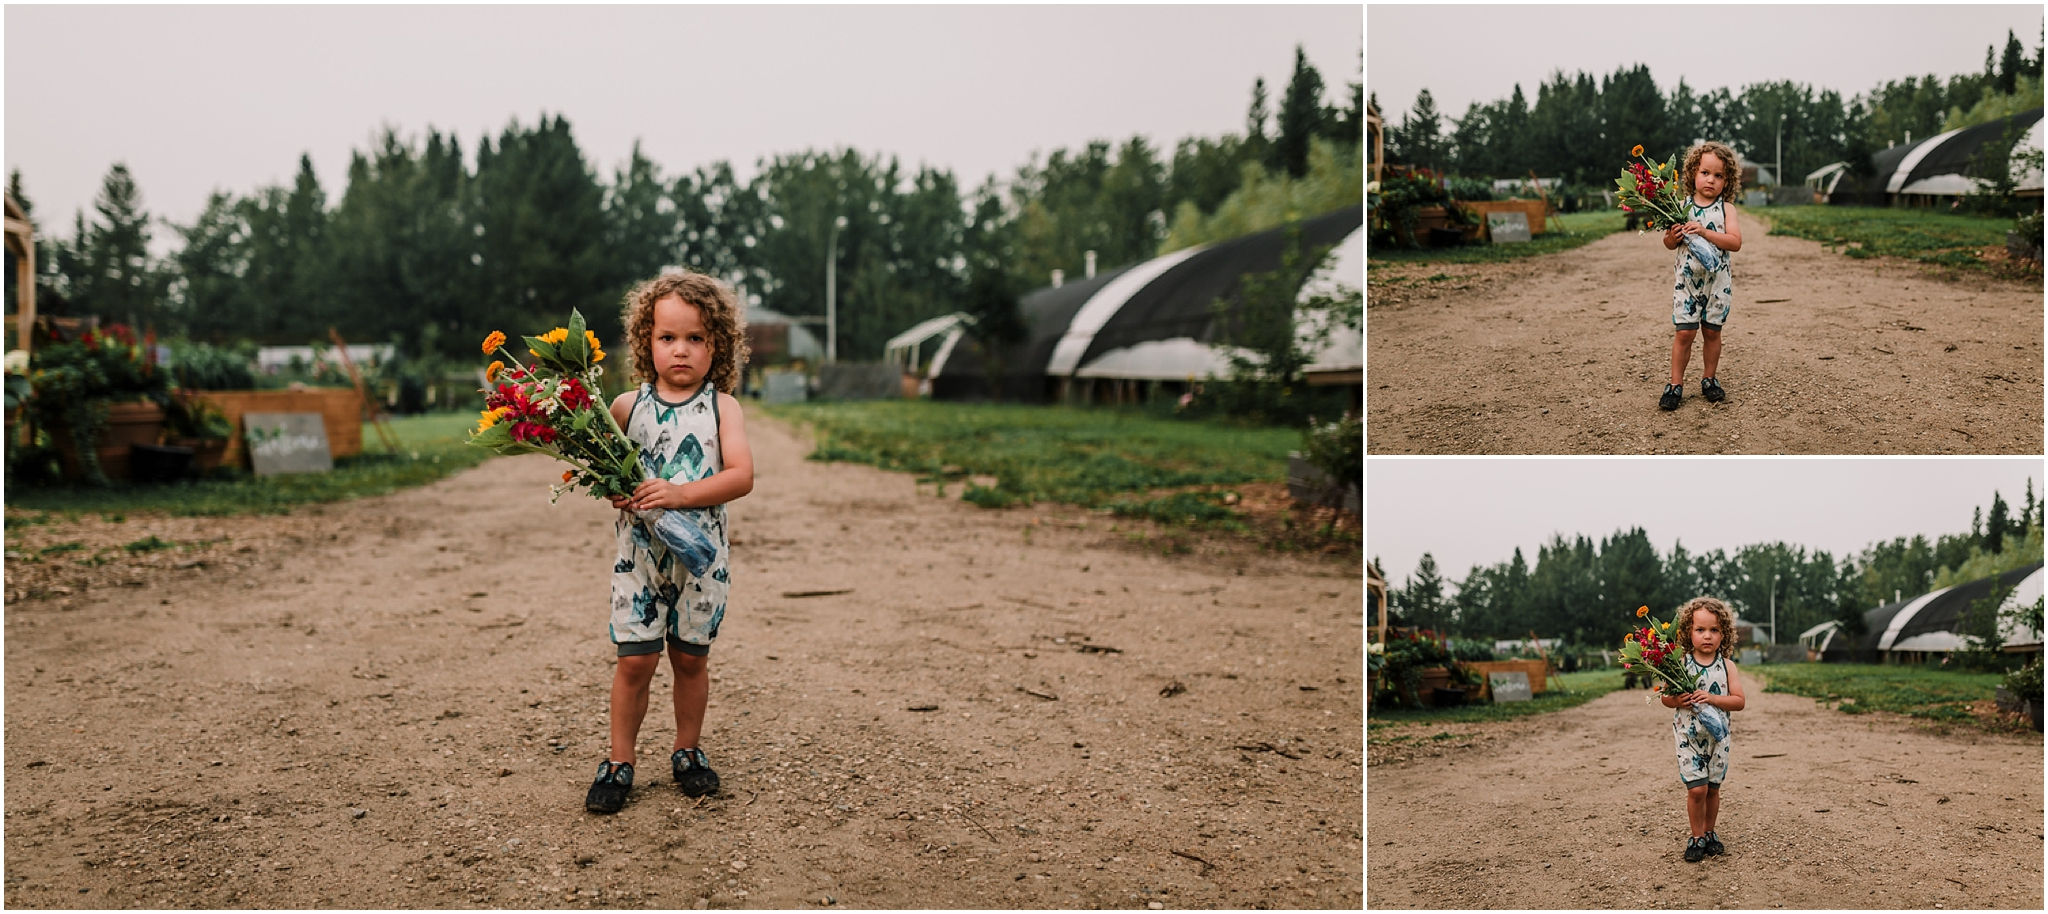 Treelines Photography - Edmonton Family Lifestyle Photography - Flower Farm - Bouquet